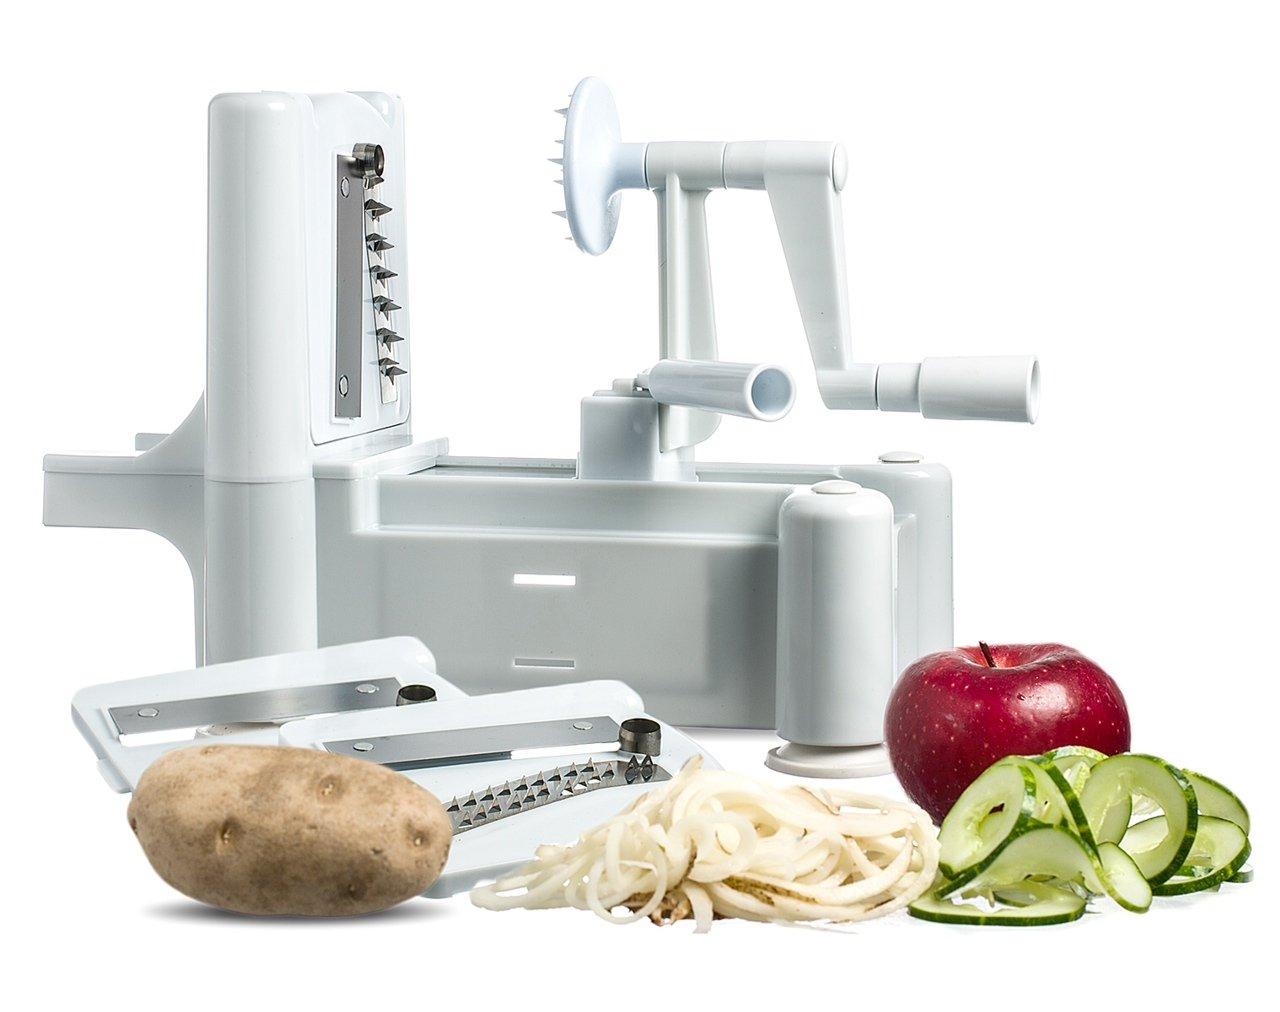 Amazon.com: New and Essential Spiralizer Tri-Blade Spiral Vegetable ...